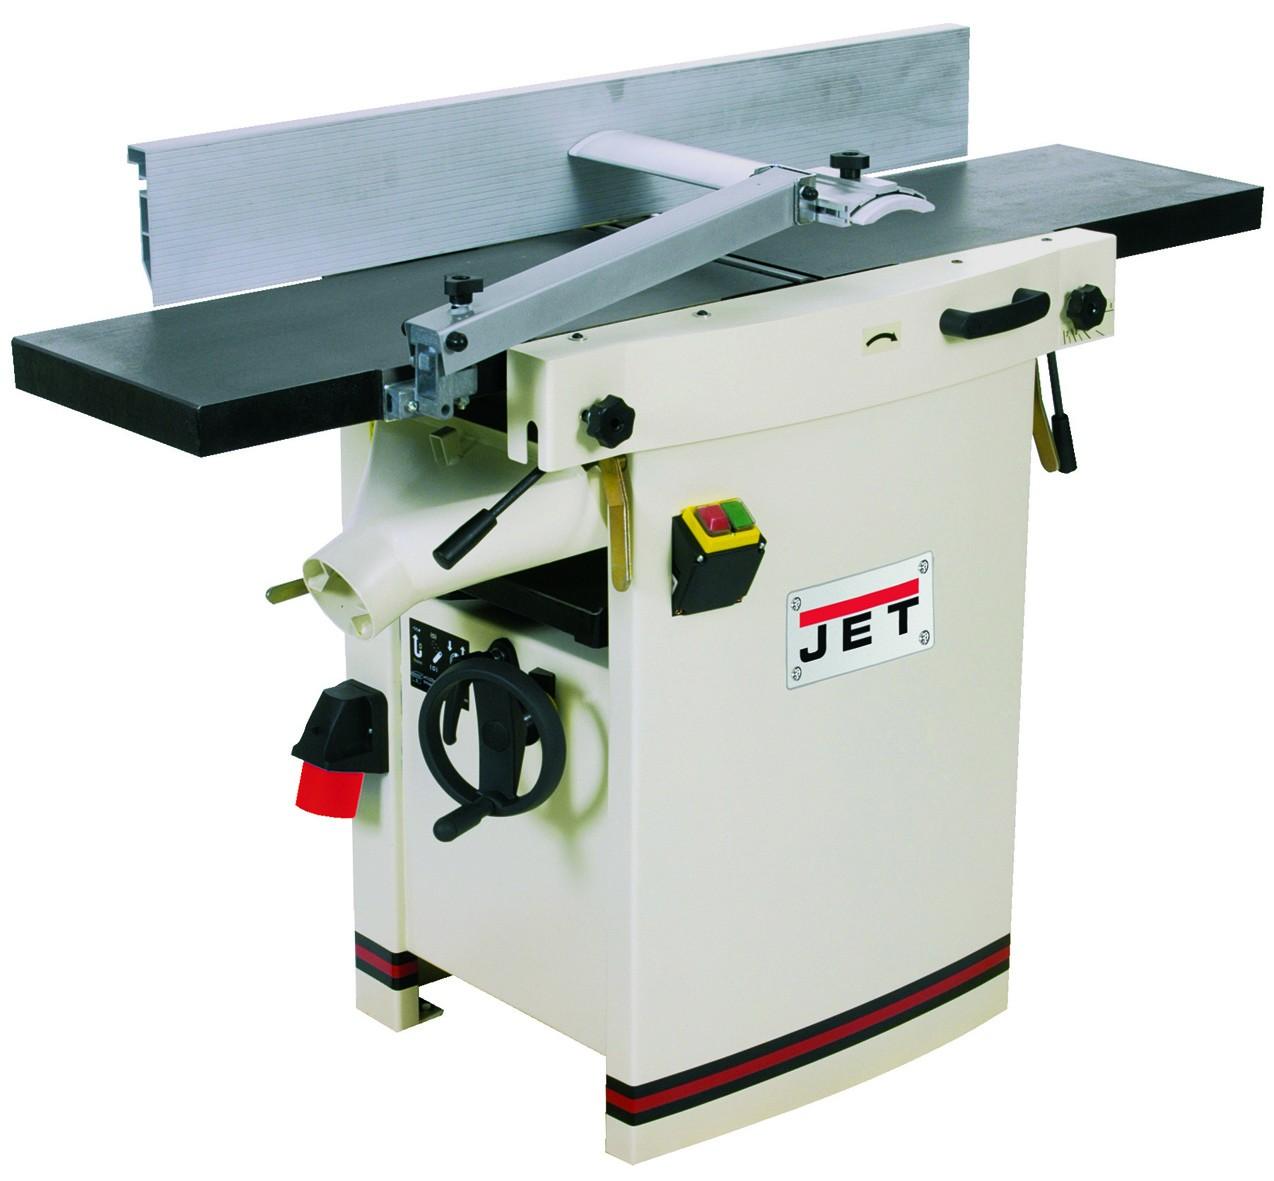 JET JPT-310HH